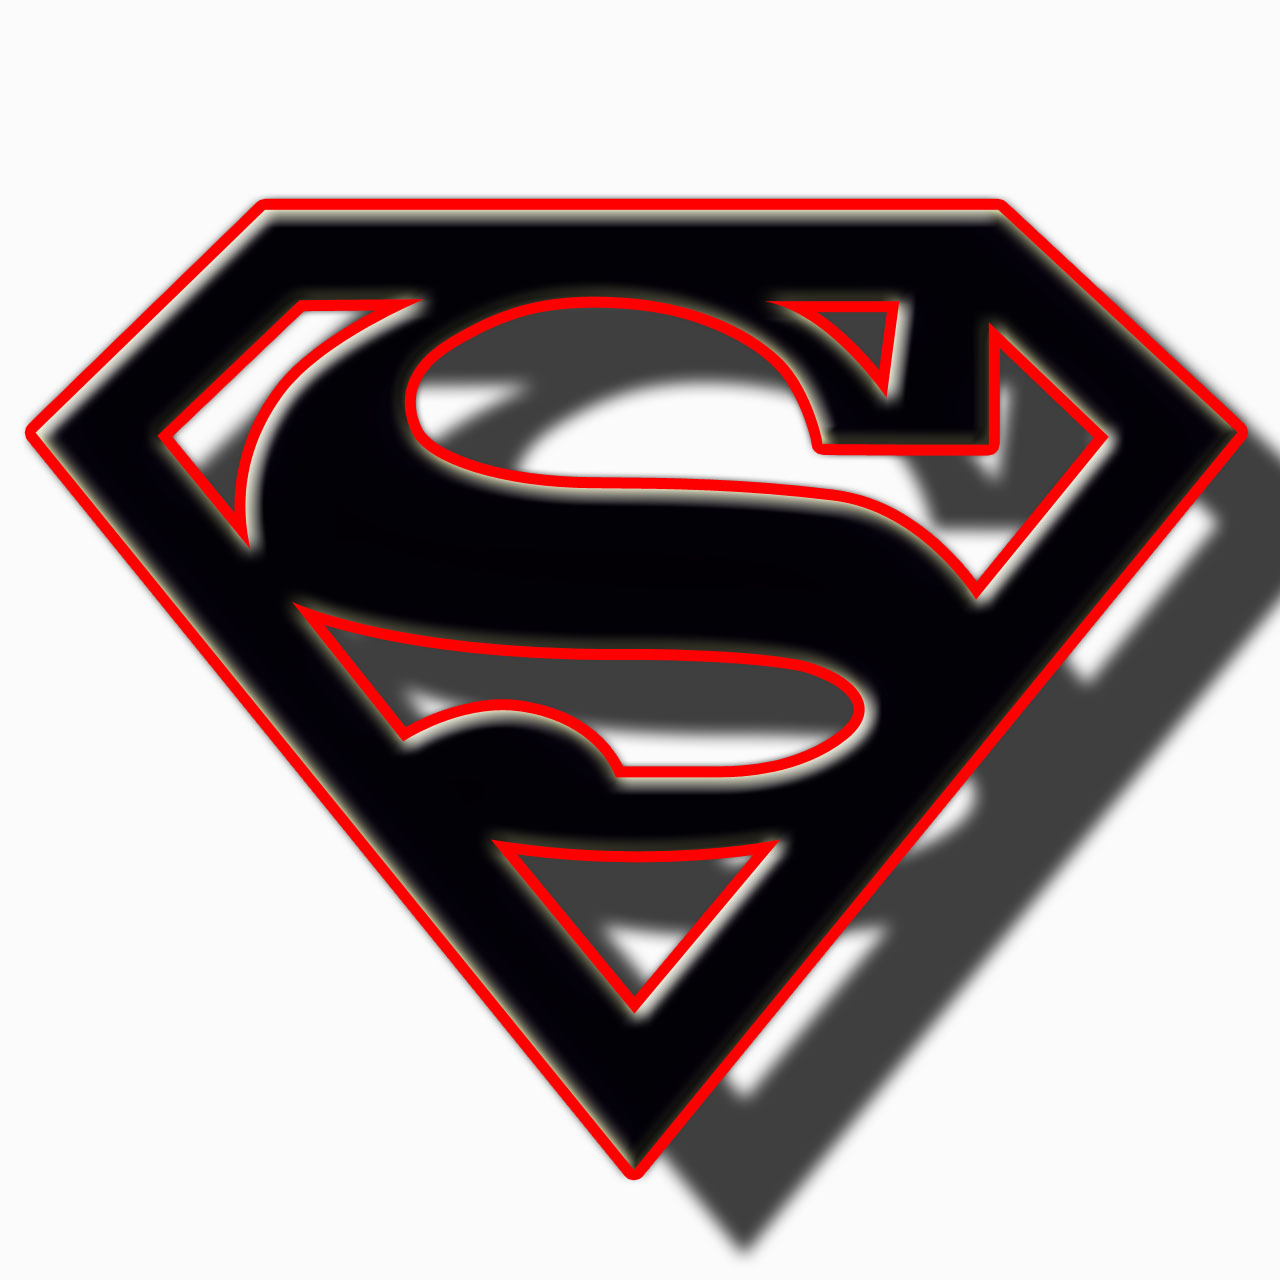 Photo Of Superman Logo - ClipArt Best